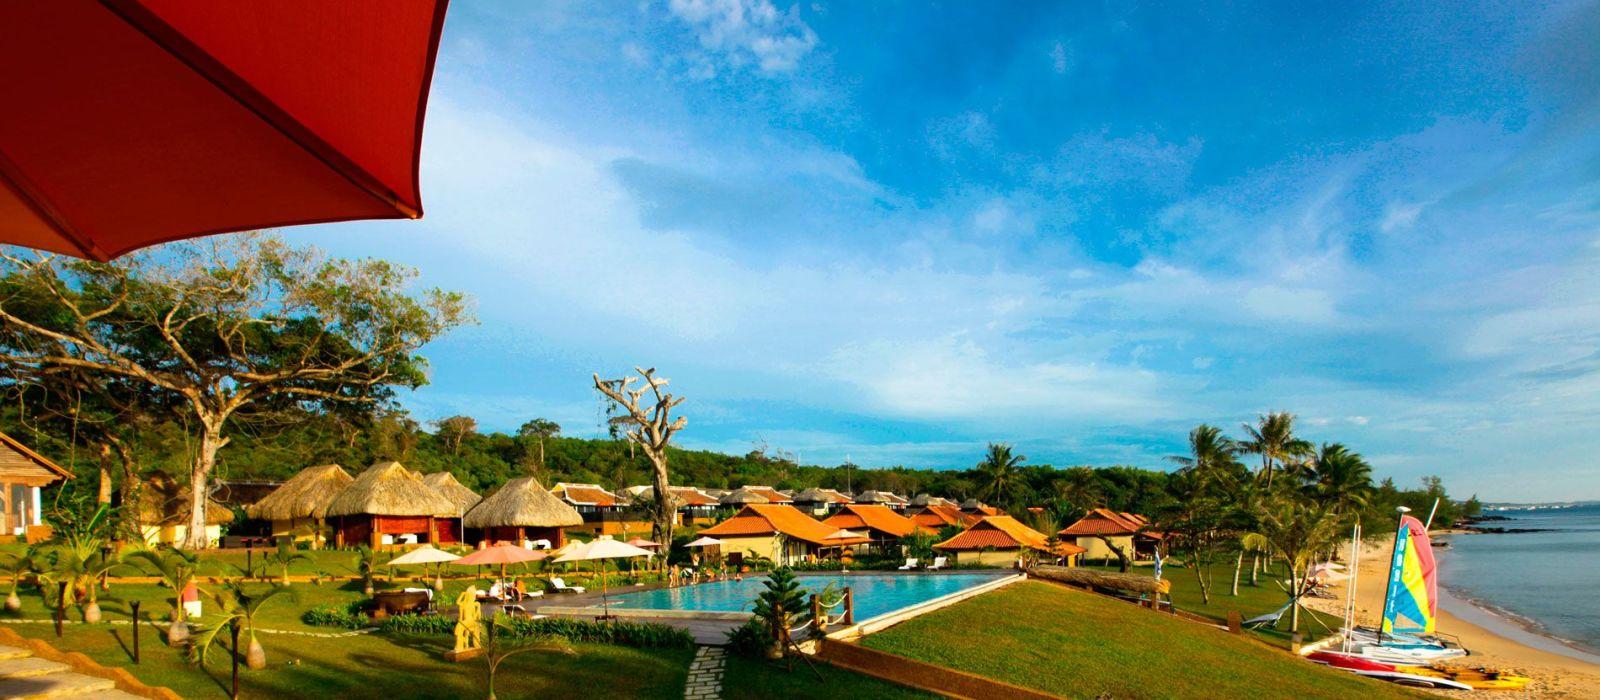 Hotel Chen Sea Resort and Spa Vietnam